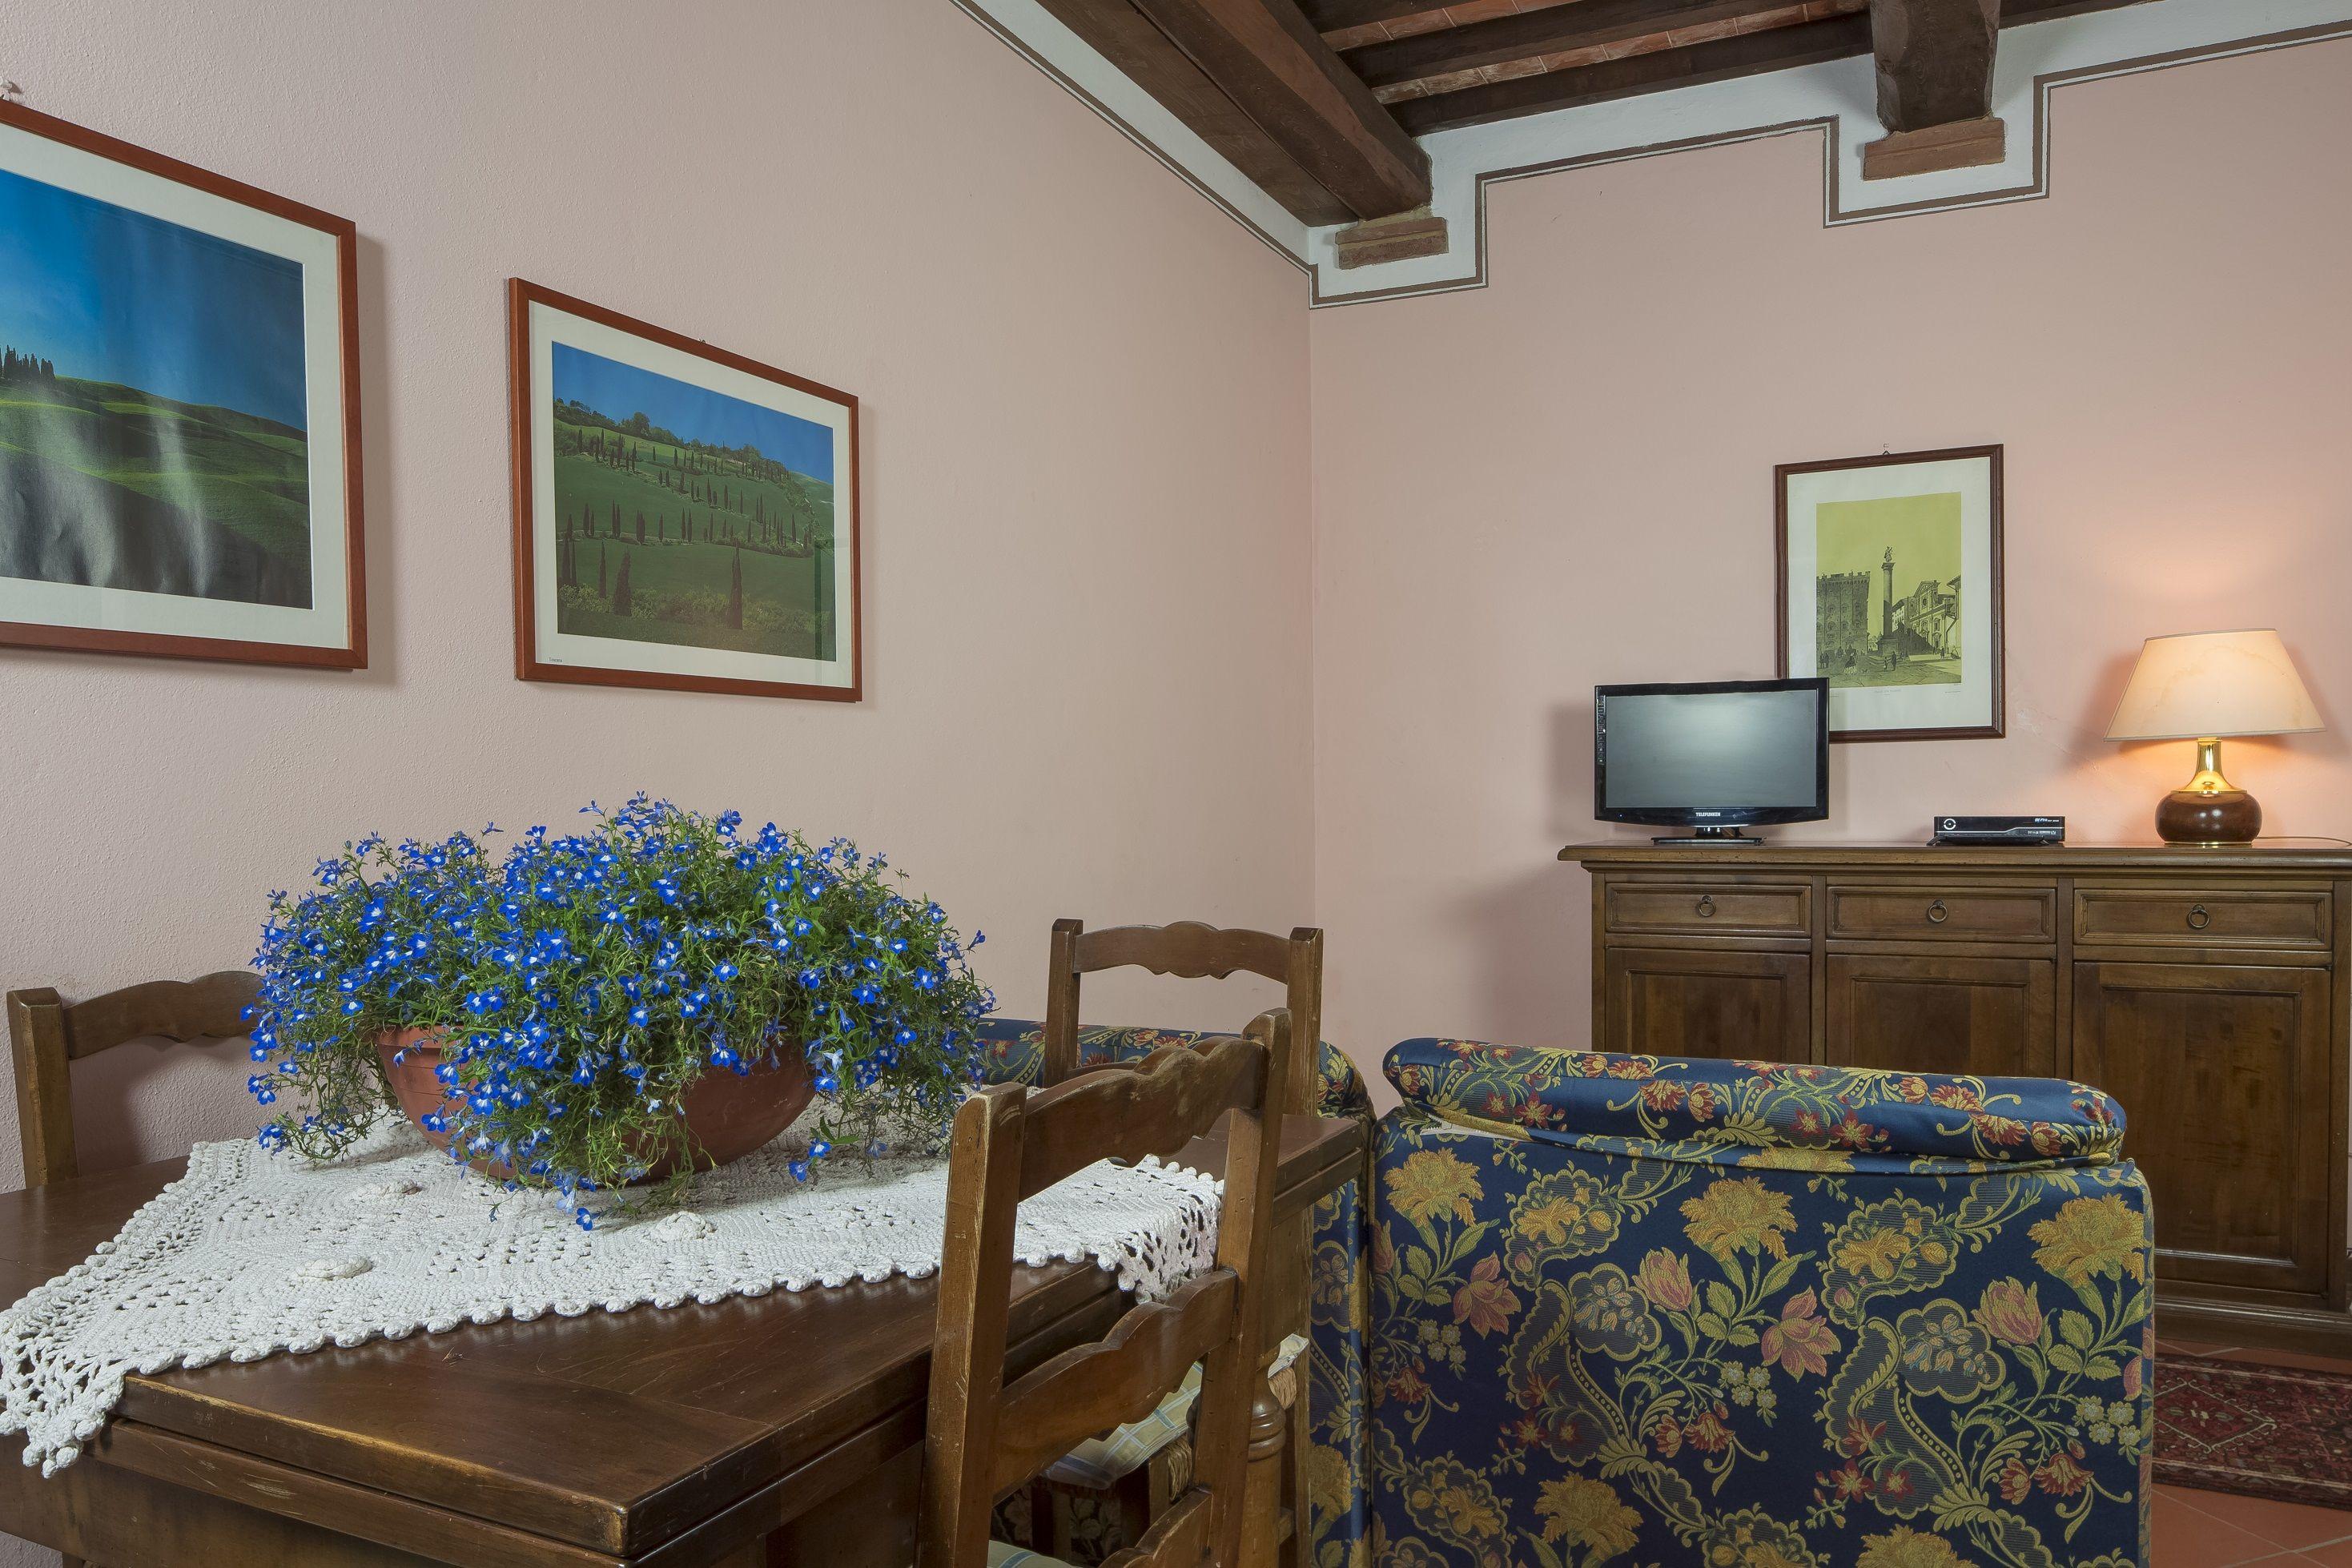 Apartment Agriturismo Il Sapito - Cherubini Holiday Home photo 16550537